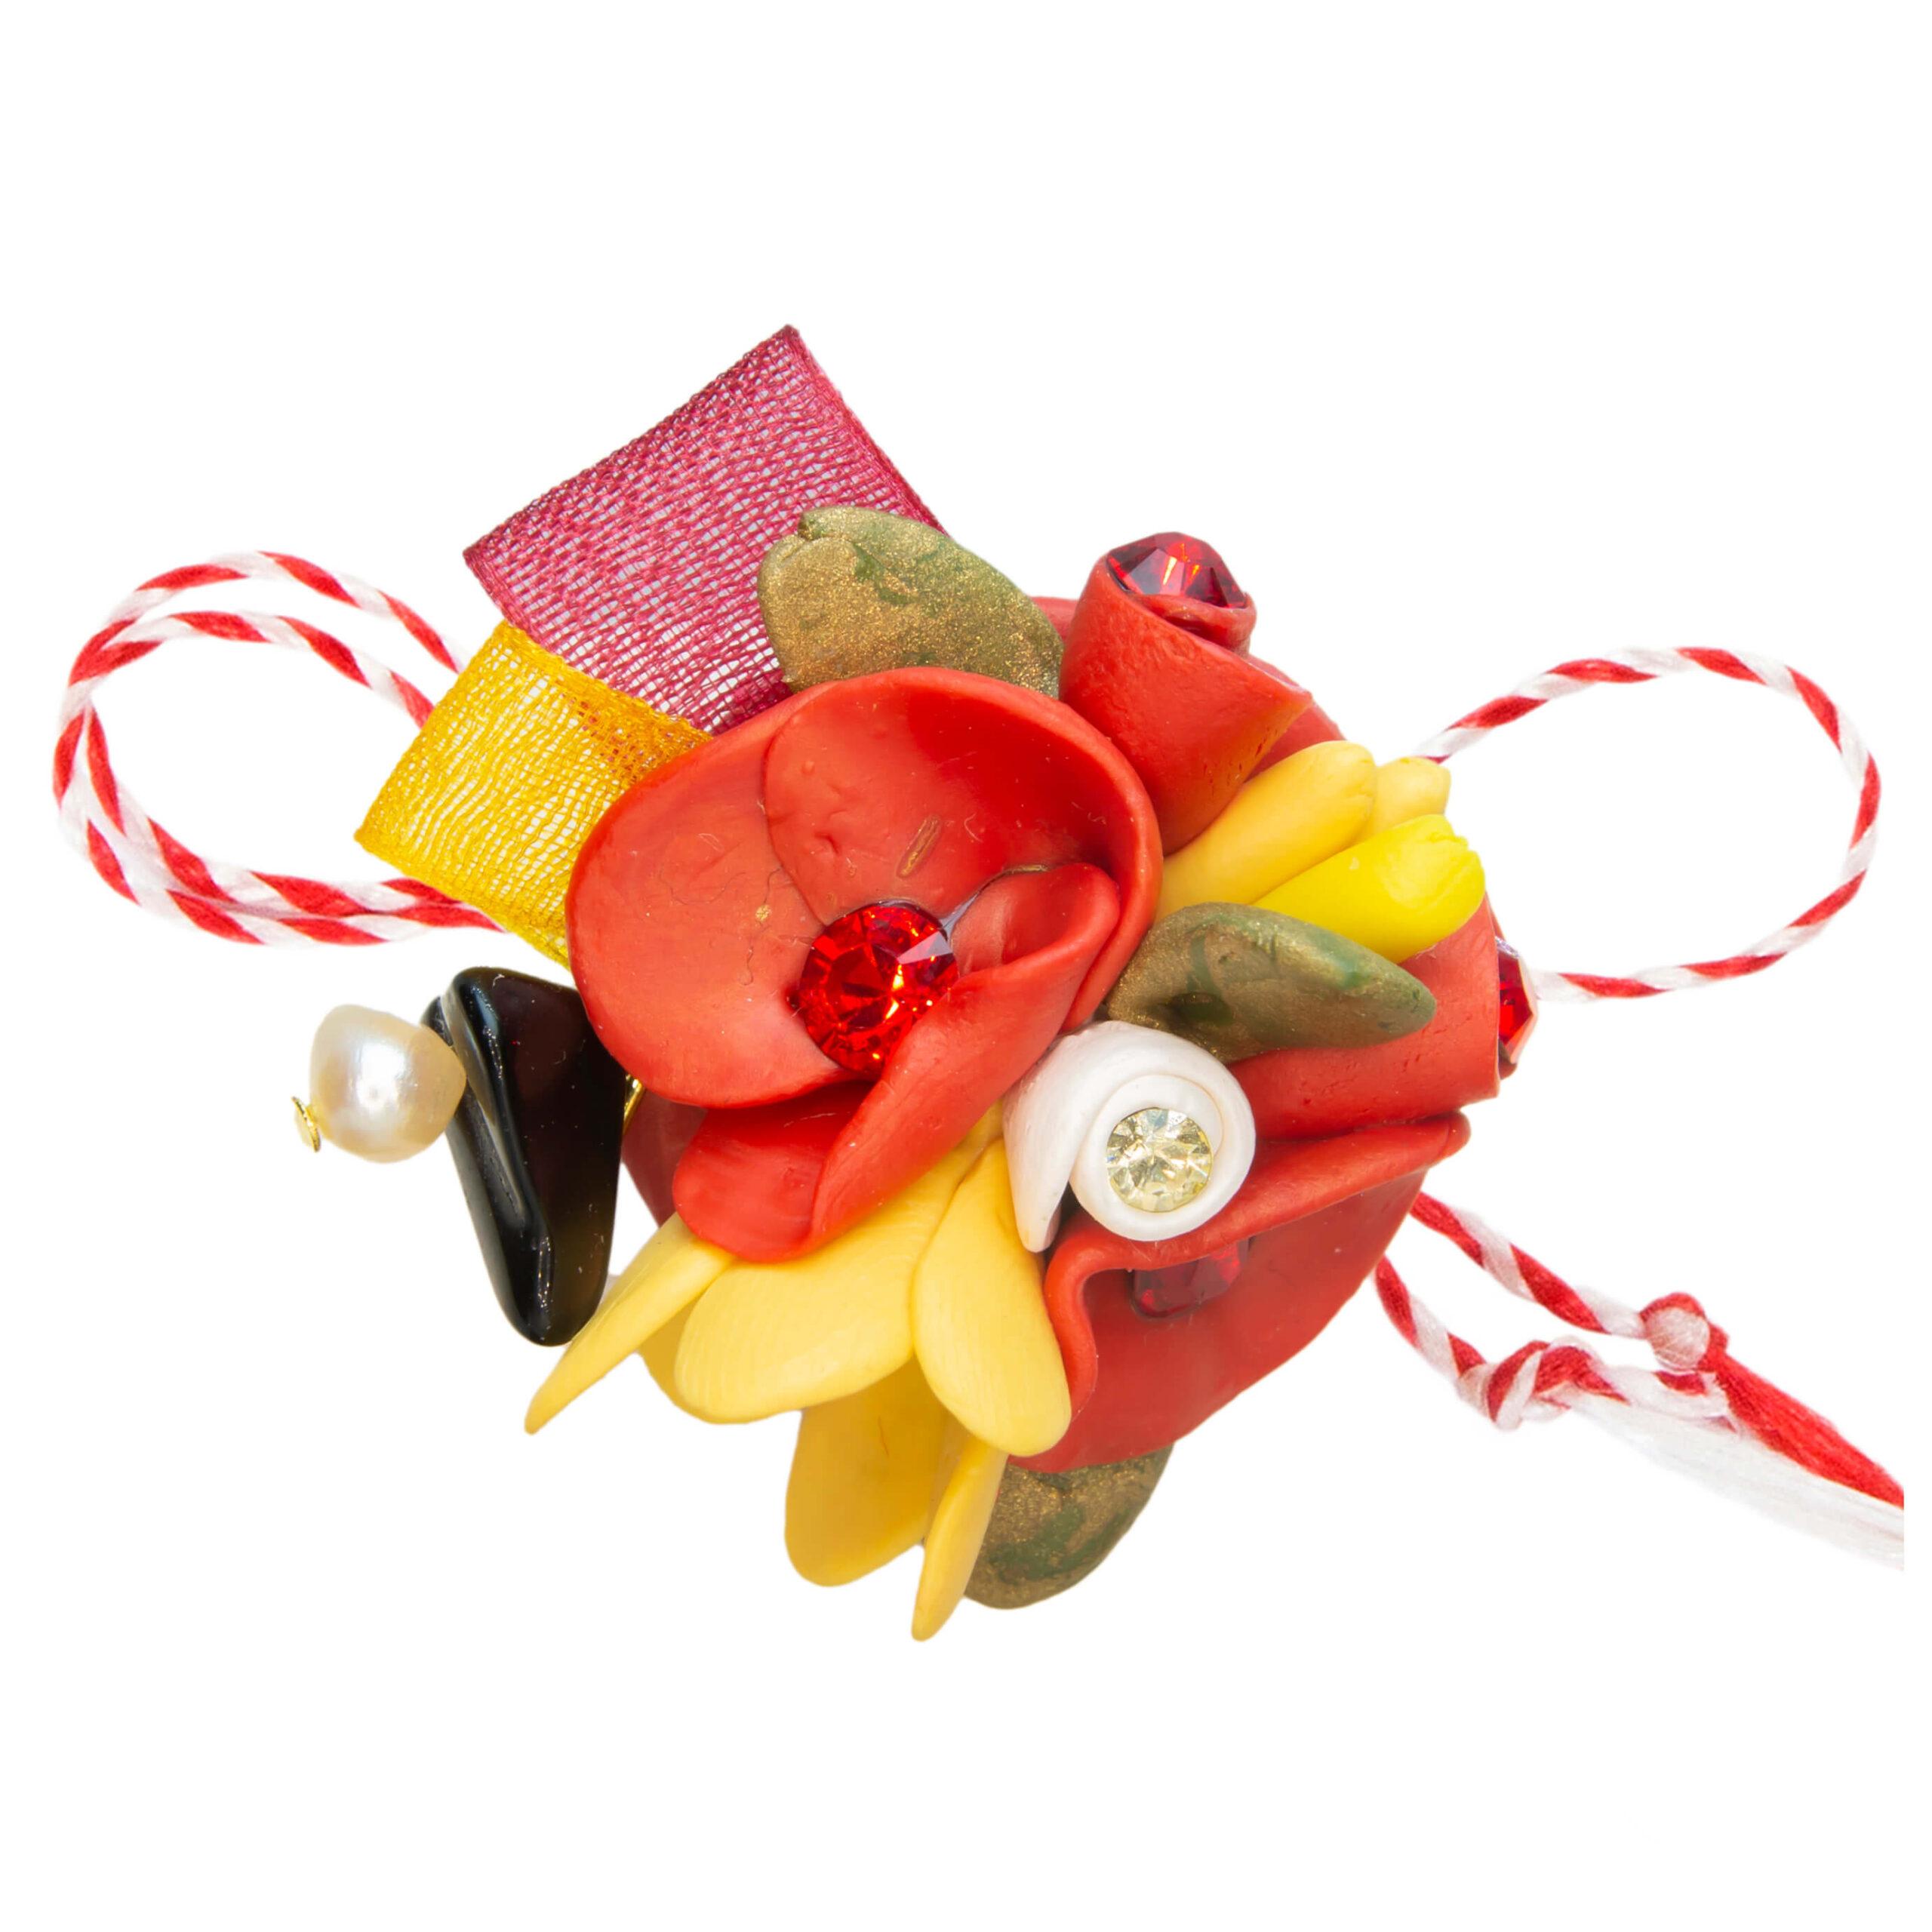 Martisor brosa buchet flori, Miidefloriart, model 50